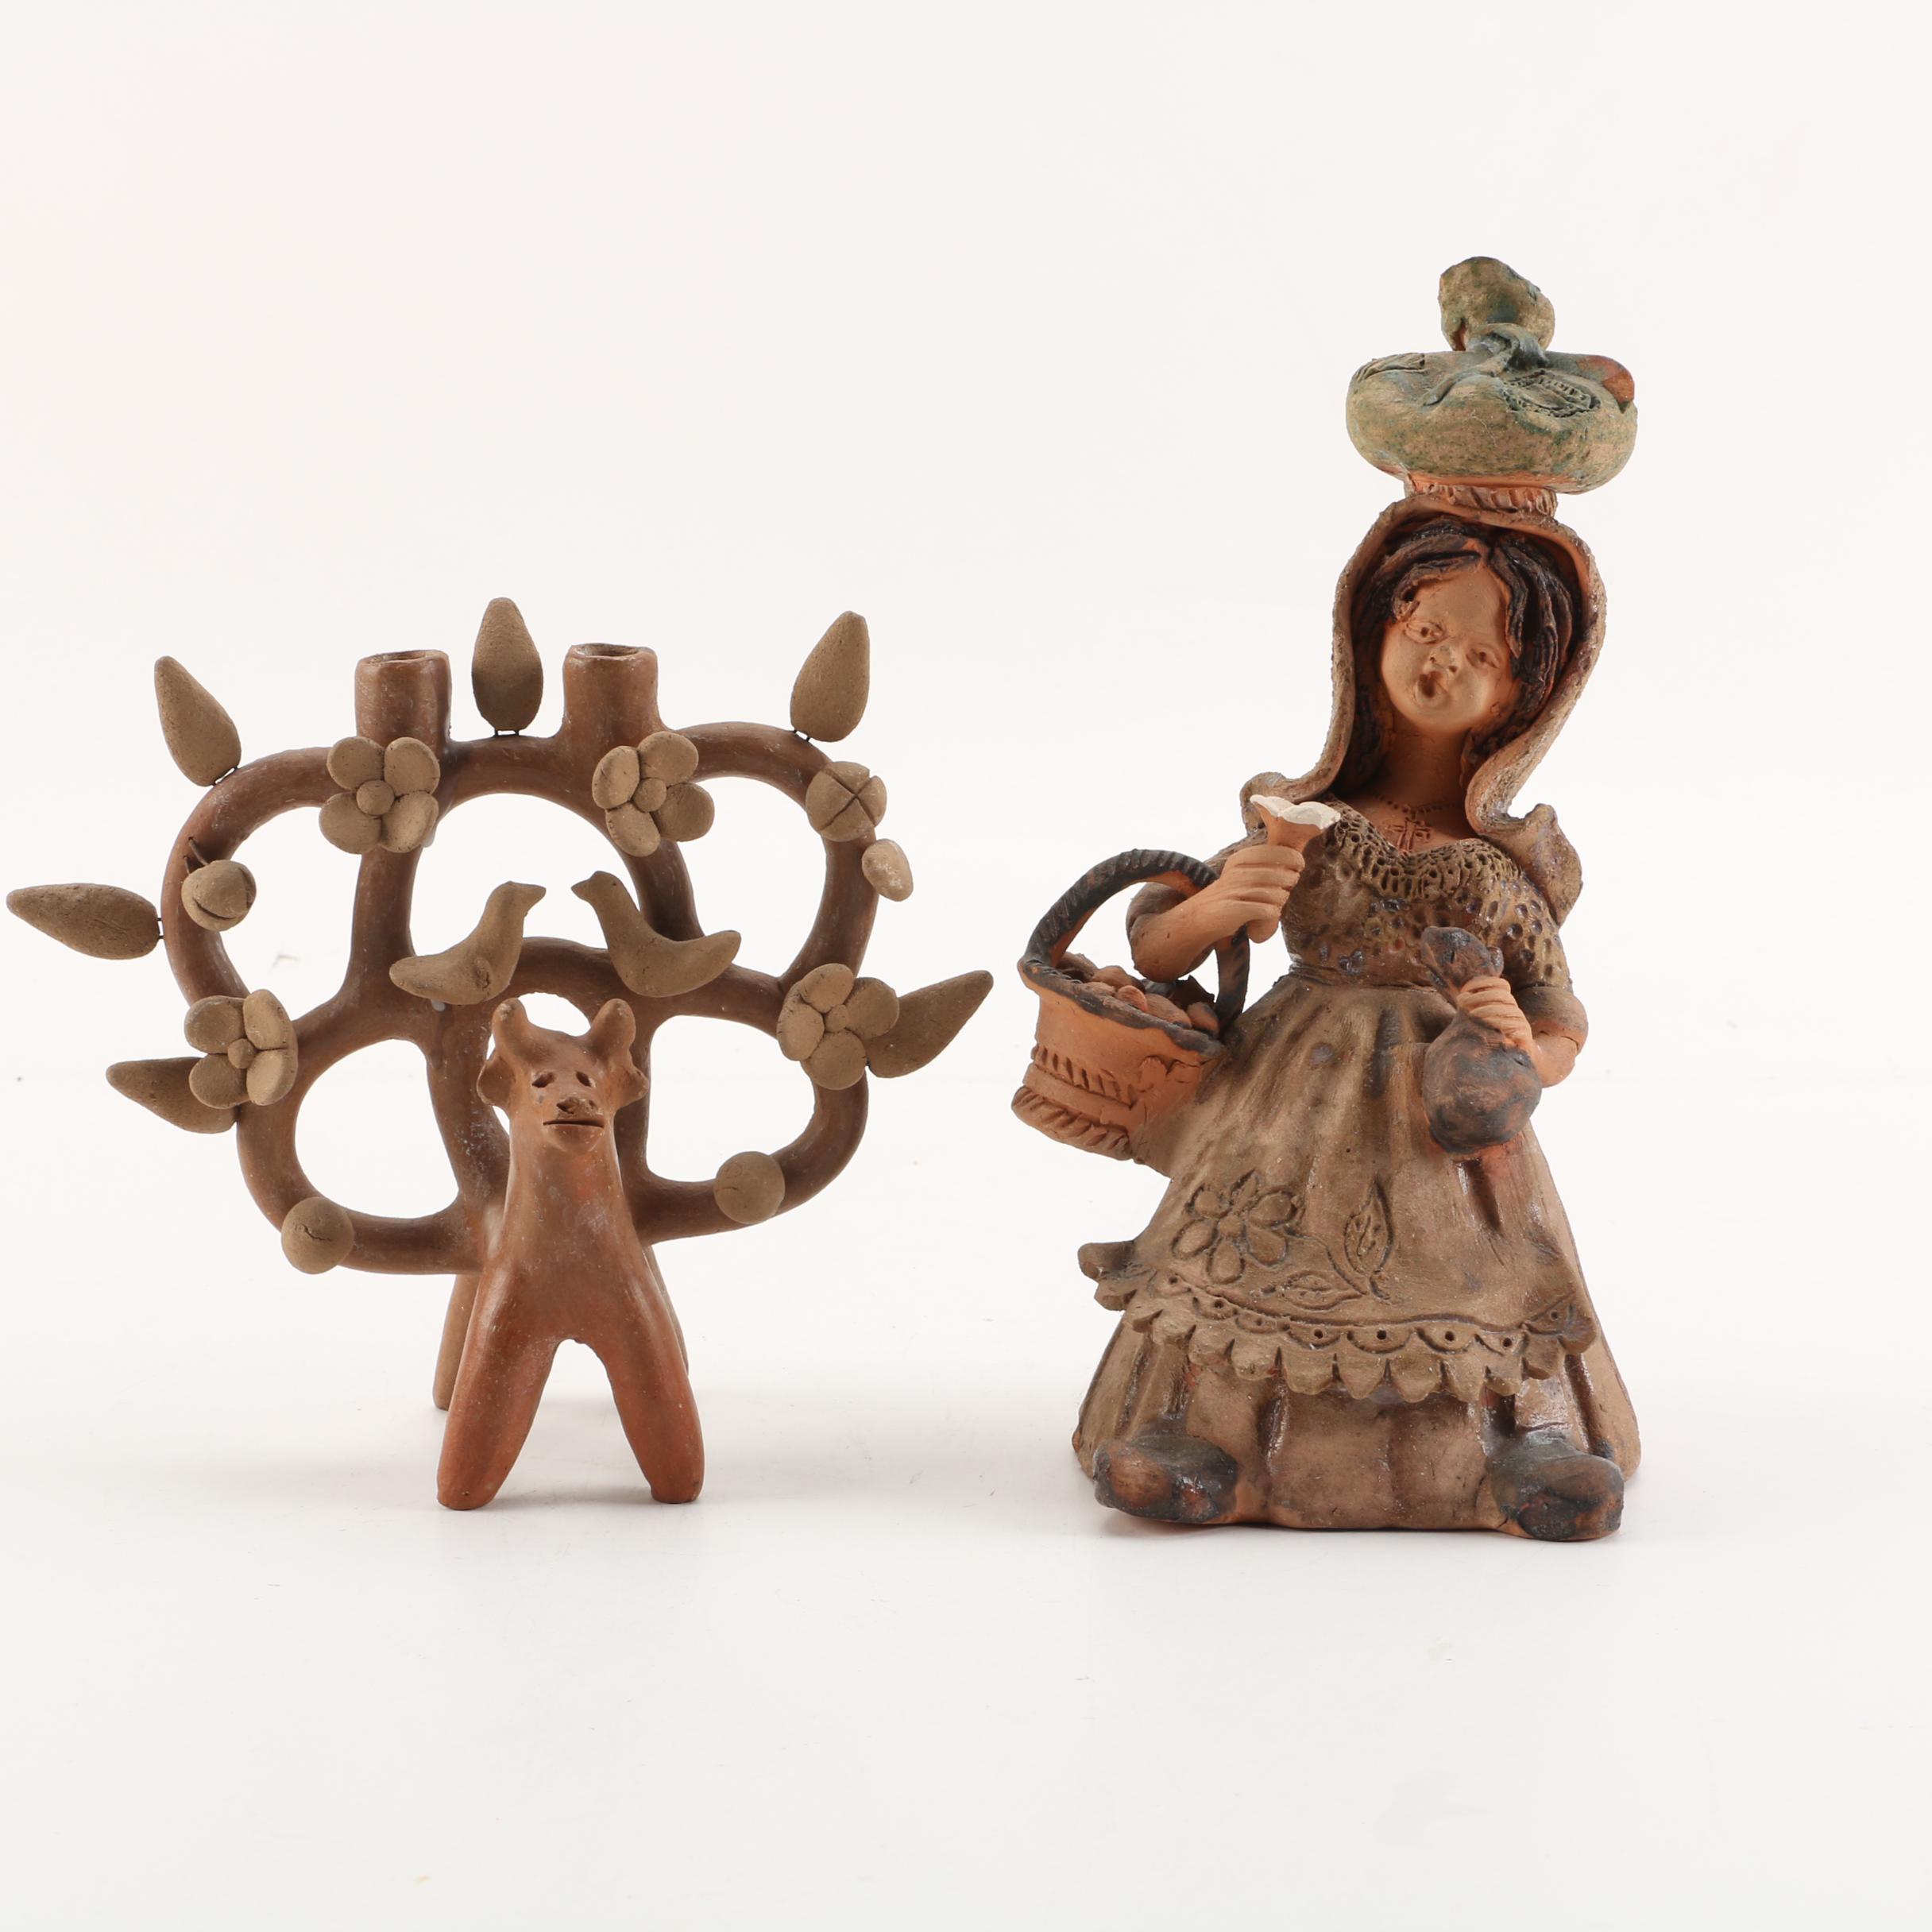 José Franco Hand-Built Terracotta Female Sculpture with Figurative Candleholder